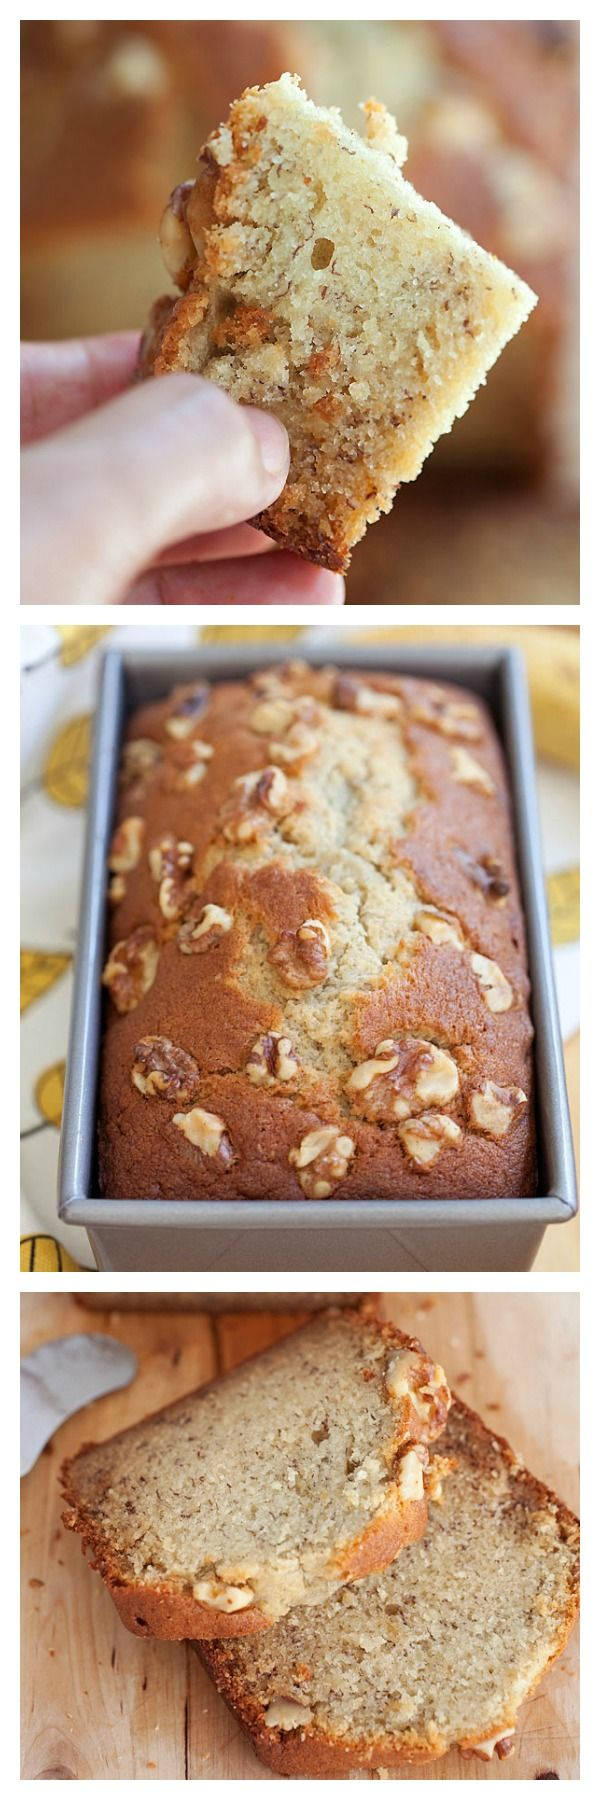 Banana bread or banana cake is everyone's favorite. Topped with walnuts, this banana bread (banana cake) recipe yields the most delicious banana bread ever | rasamalaysia.com